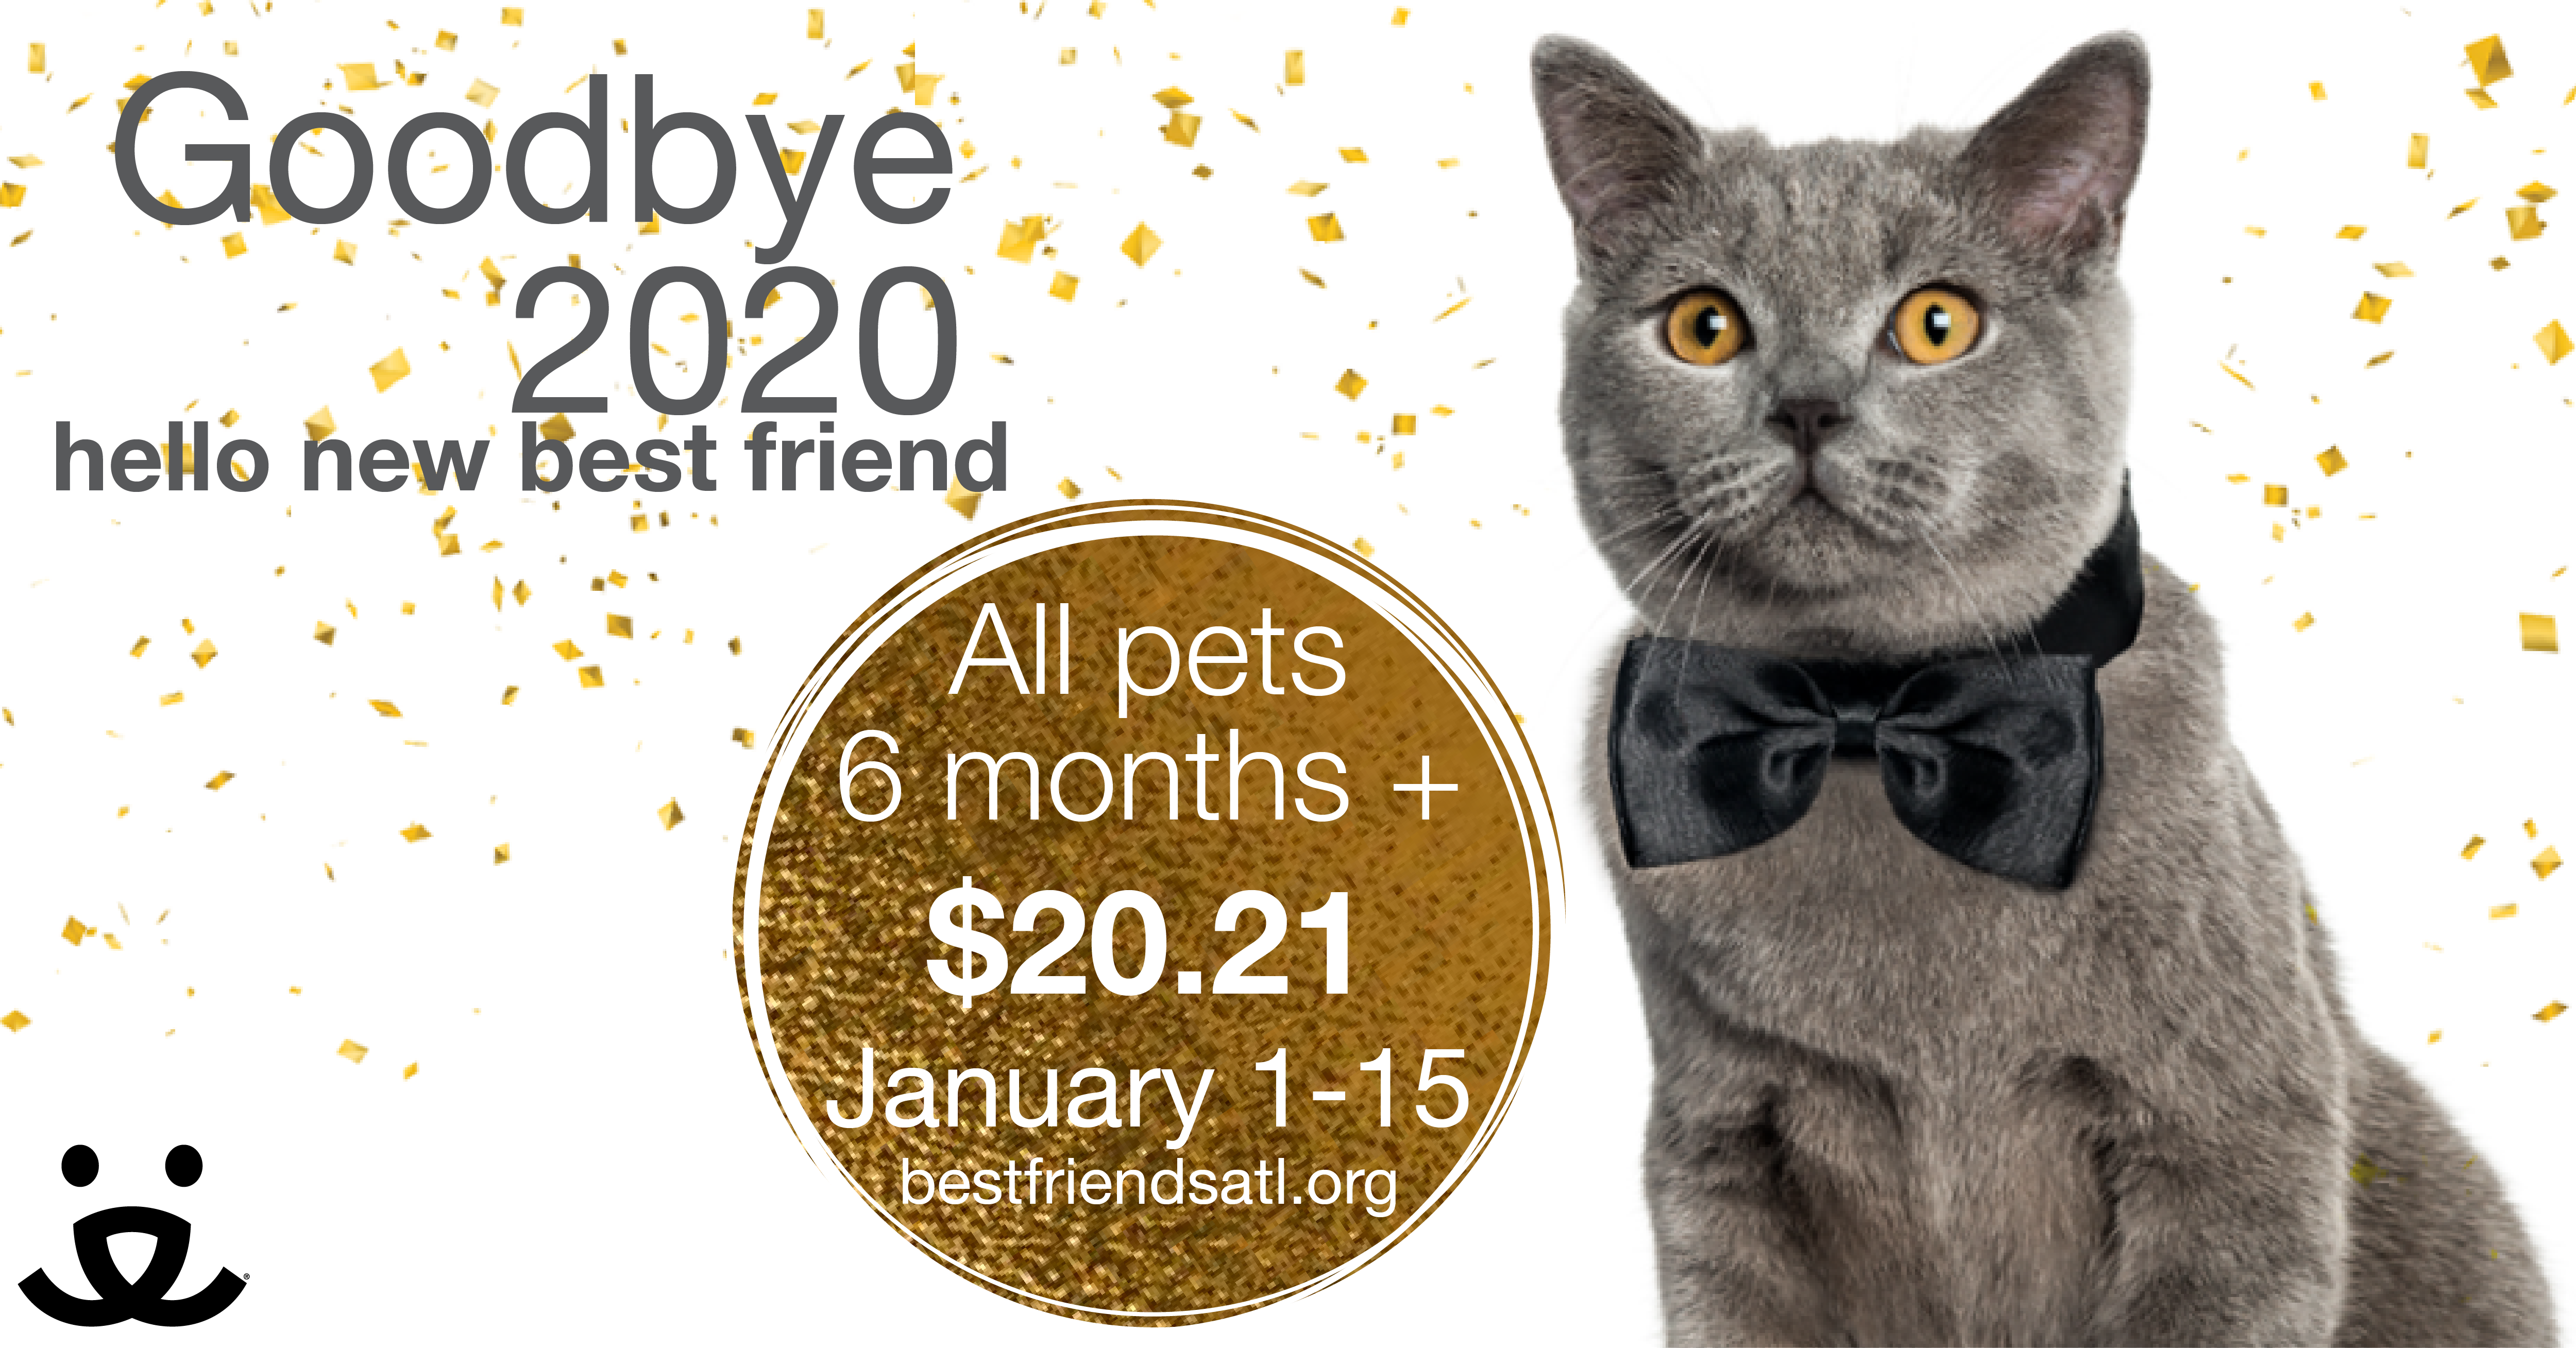 $20.21 adoption fees through january 15